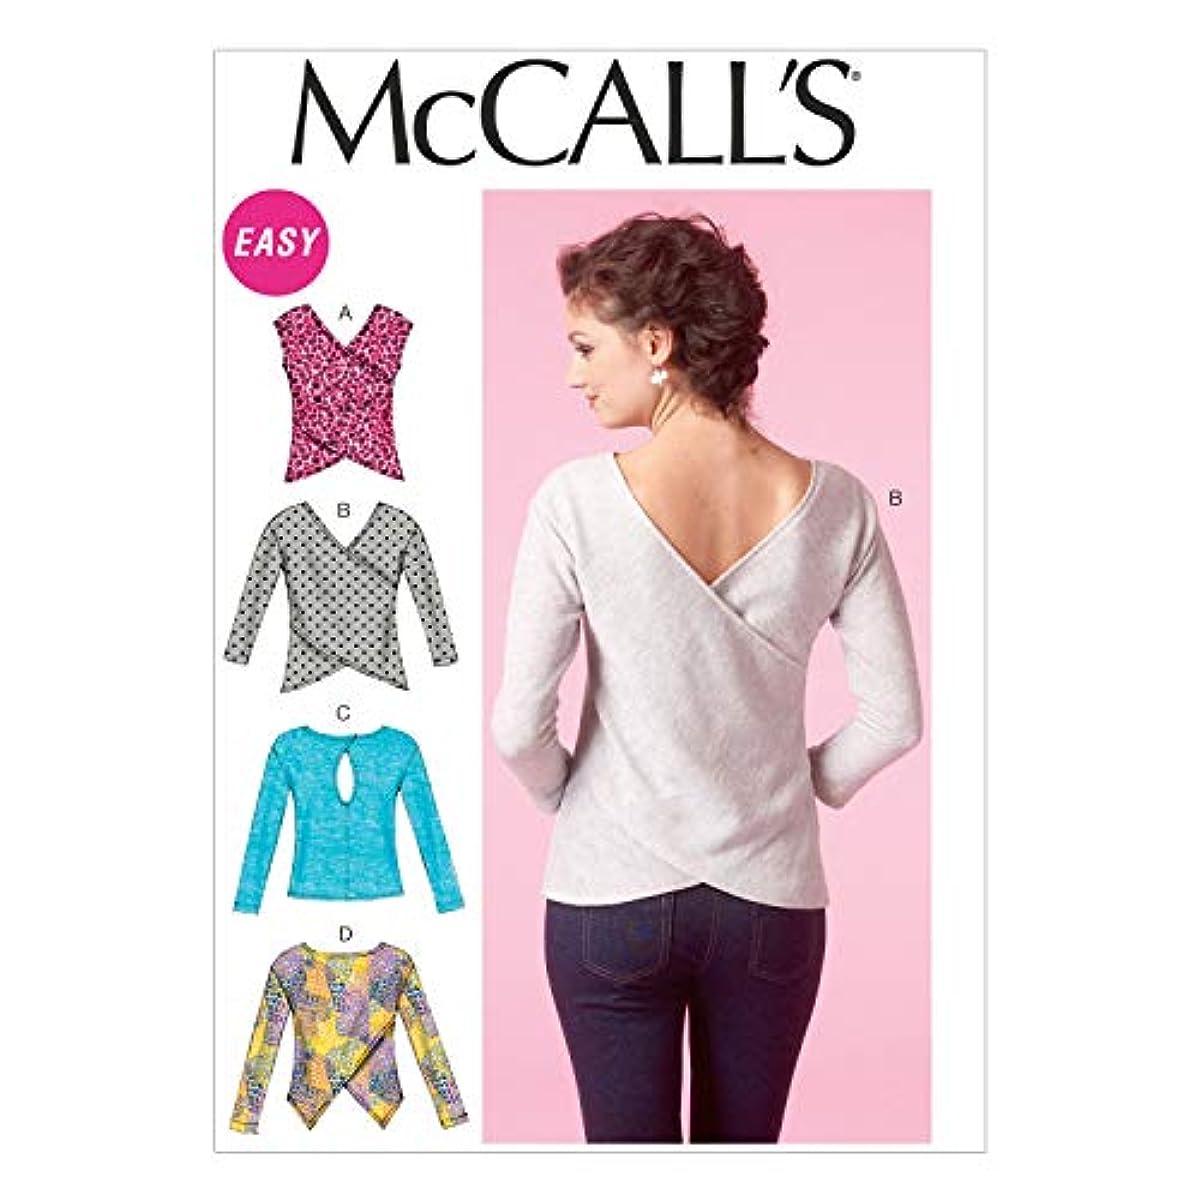 McCall's Patterns M7127-E50 Misses' Tops-14-16-18-20-22, Size E5 (14-16-18-20-22)